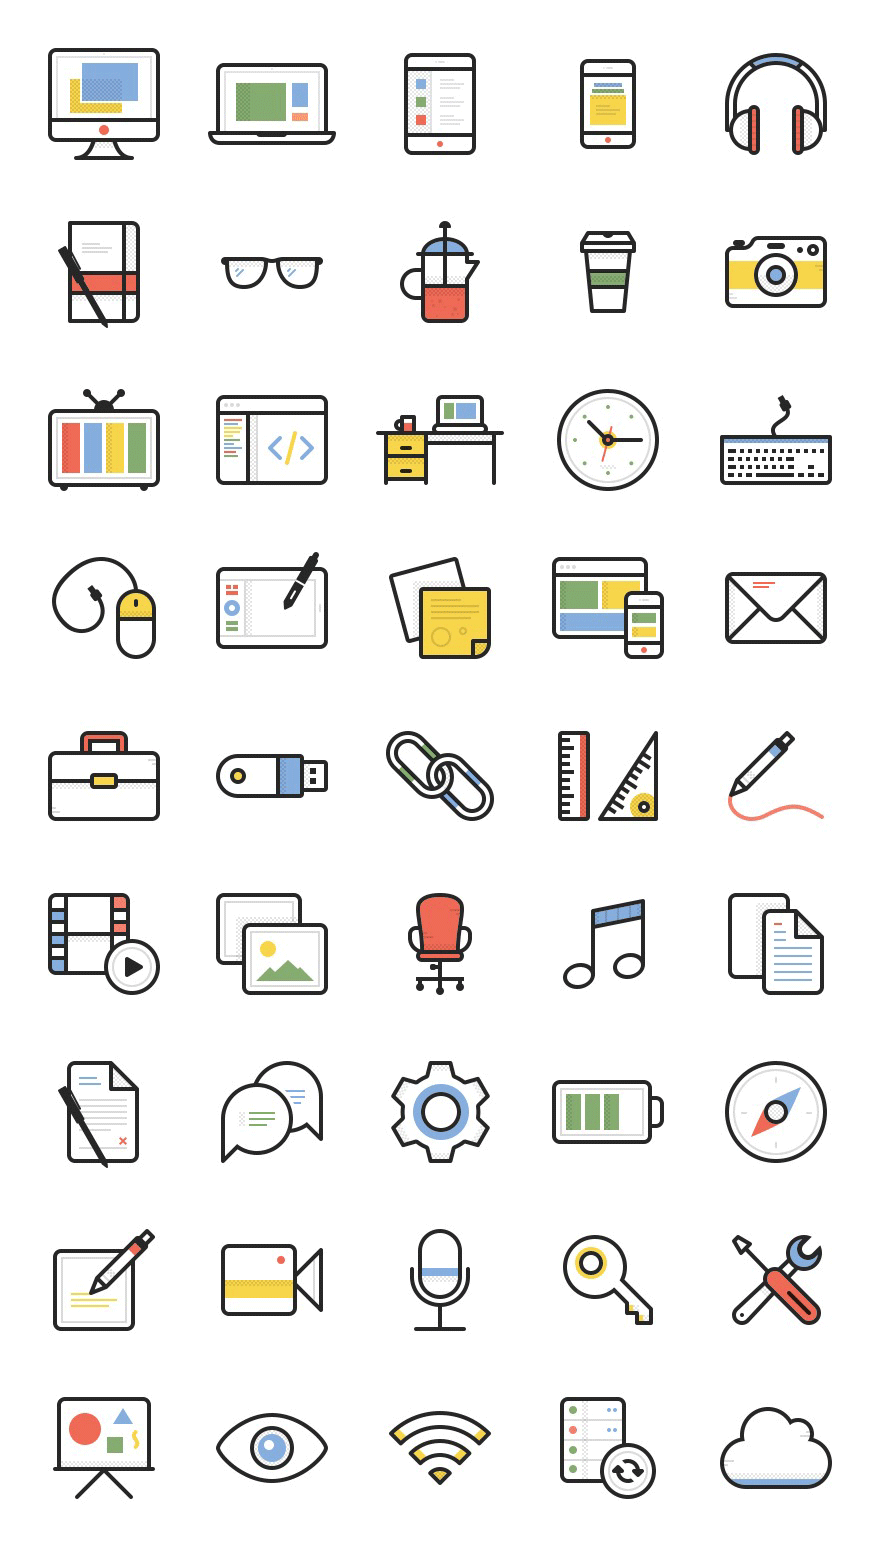 Freebie: Dashel Icon Set (45 Icons, SVG, PSD, PNG) - Smashing Magazine …